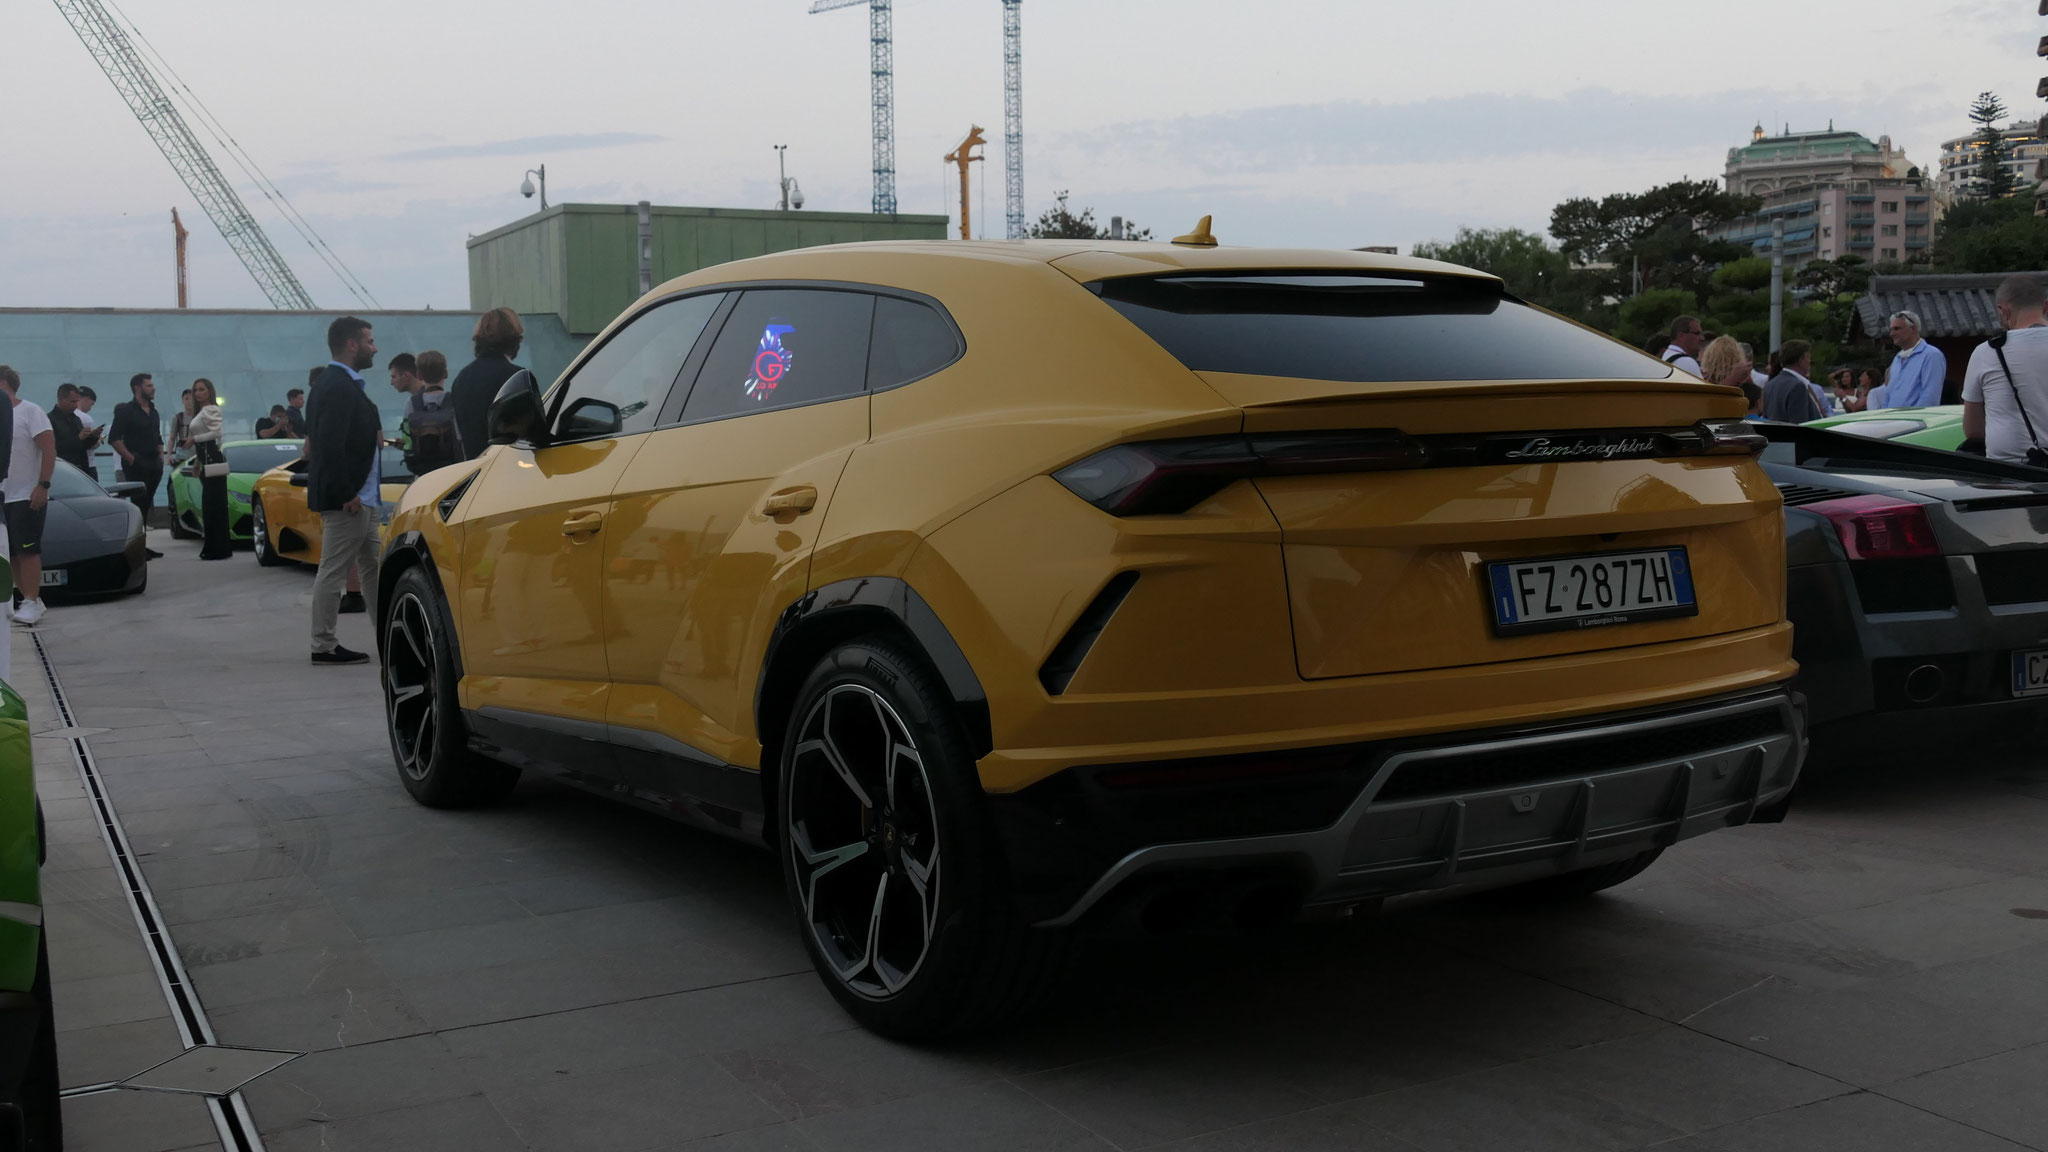 Lamborghini Urus - FZ-287-ZH (ITA)